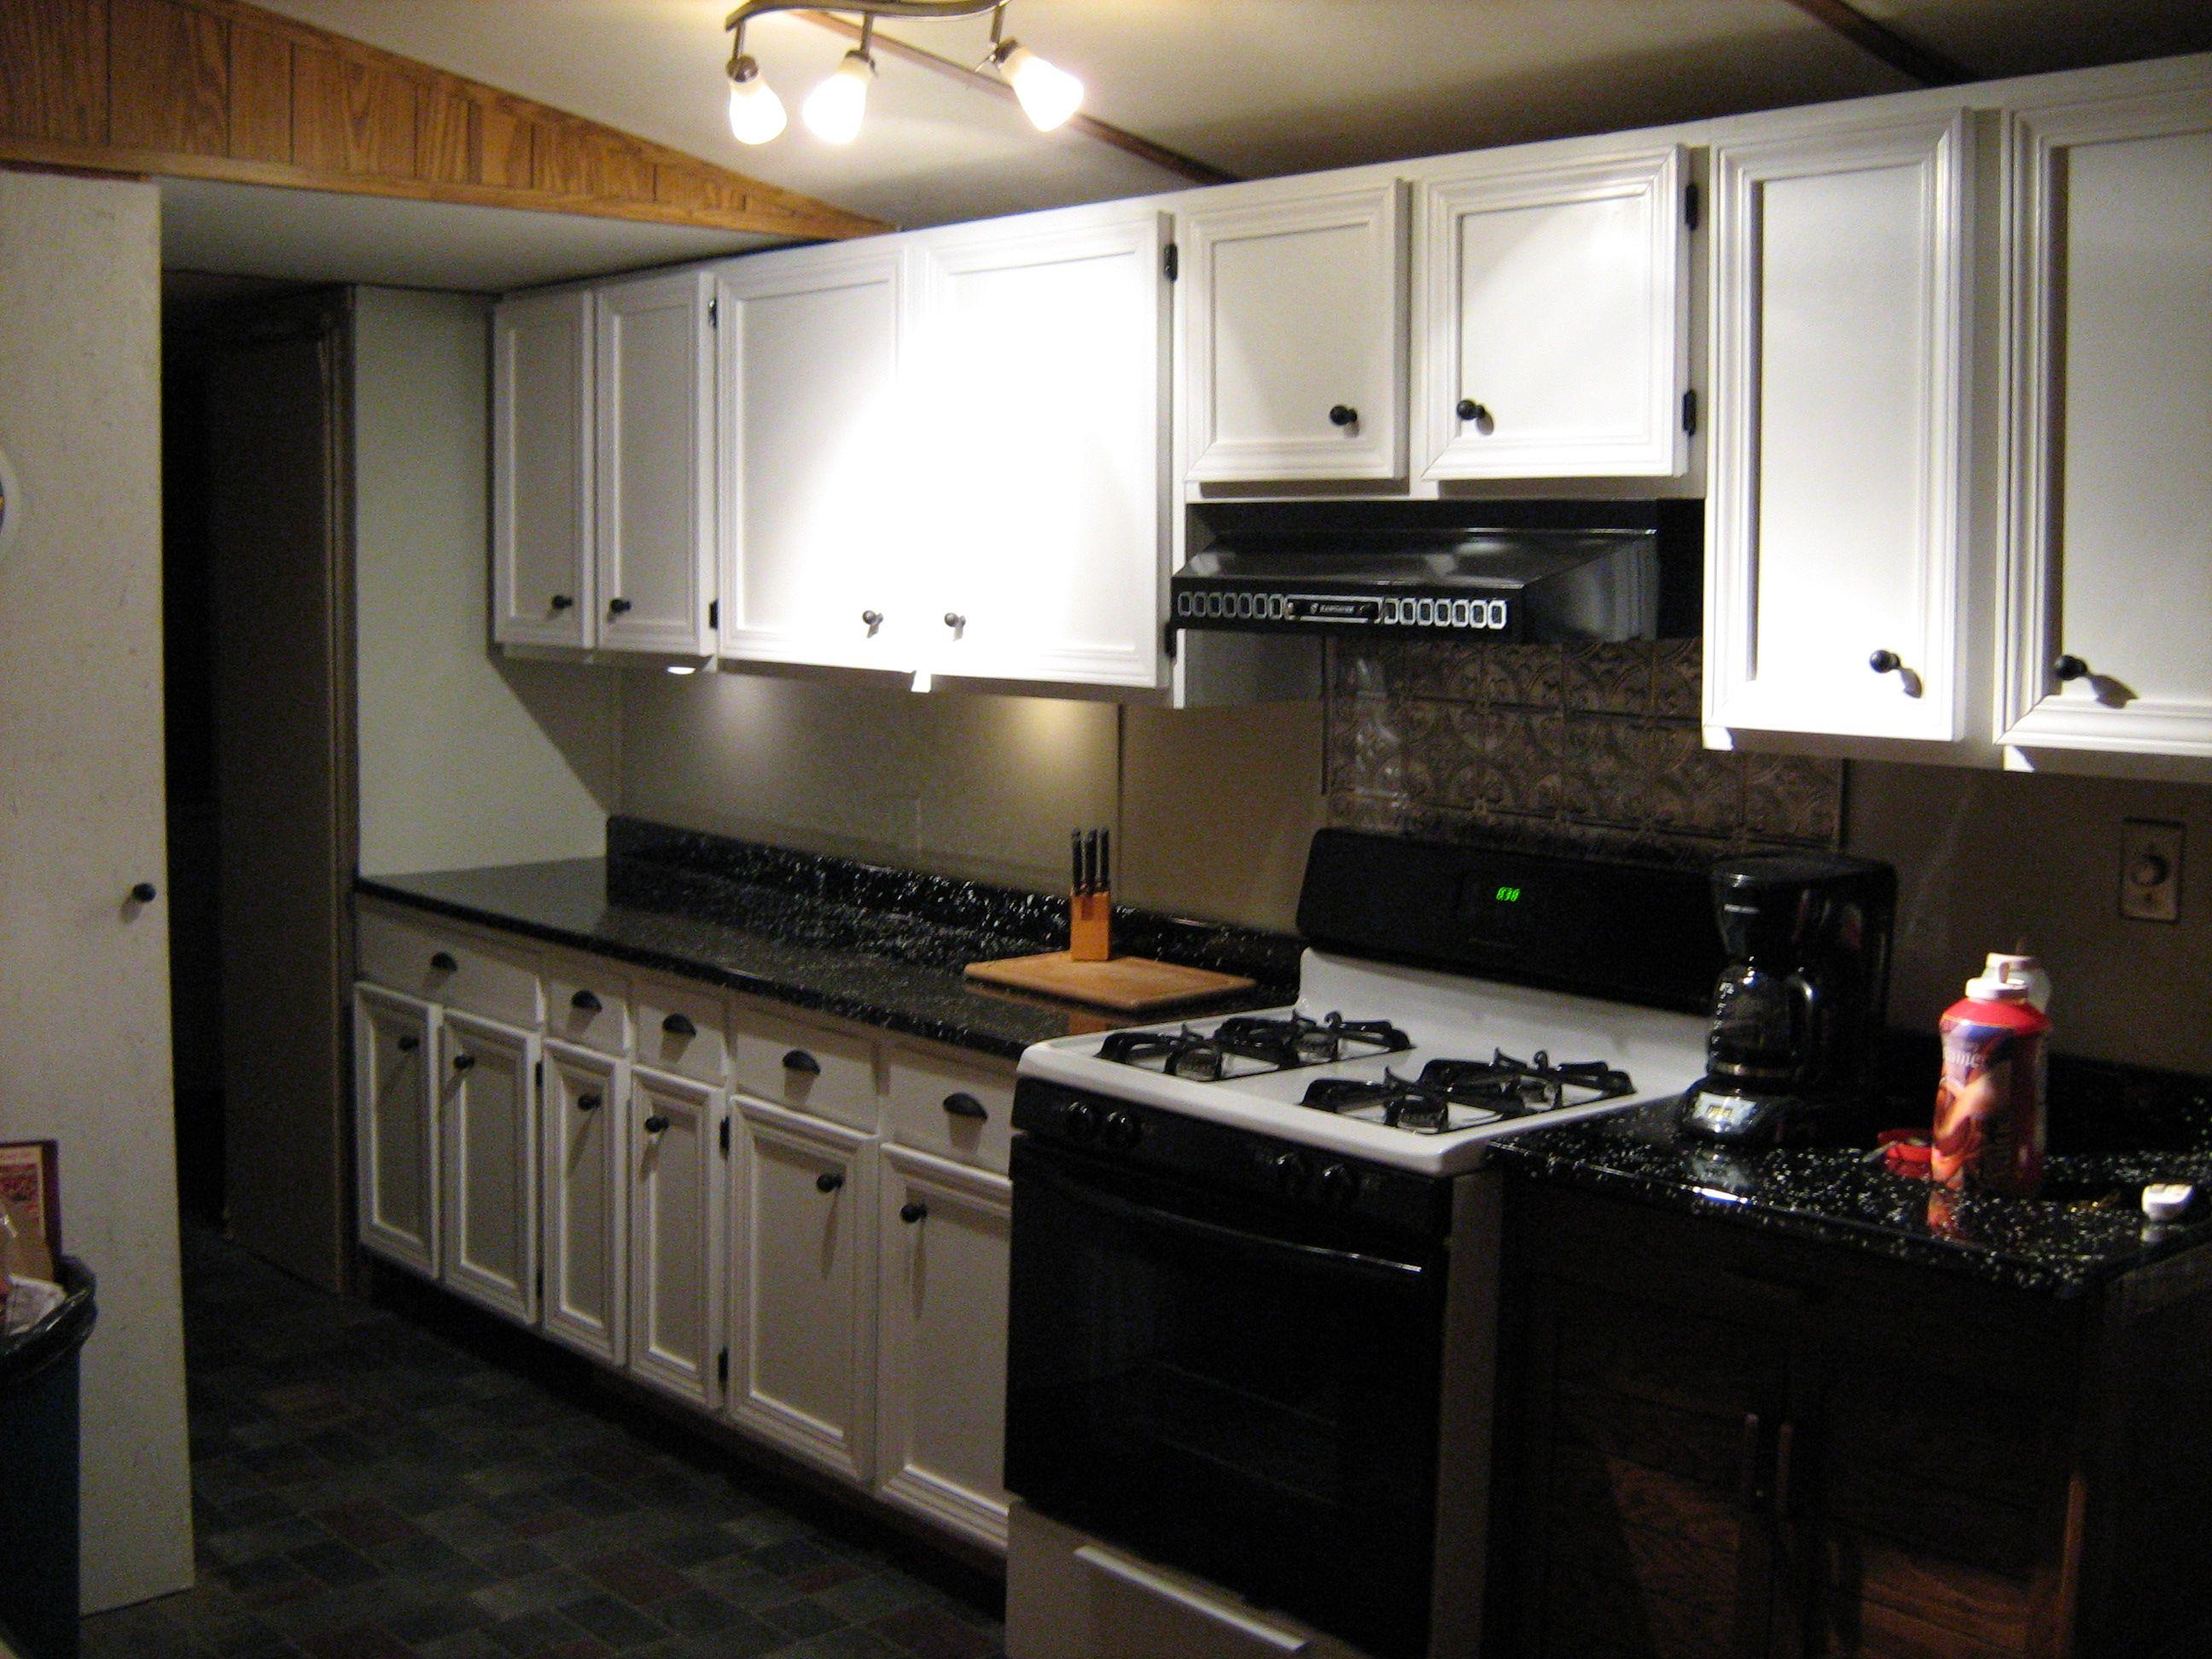 http://robertbloggert.hubpages.com/hub/My-affordable-DIY-kitchen-remodel